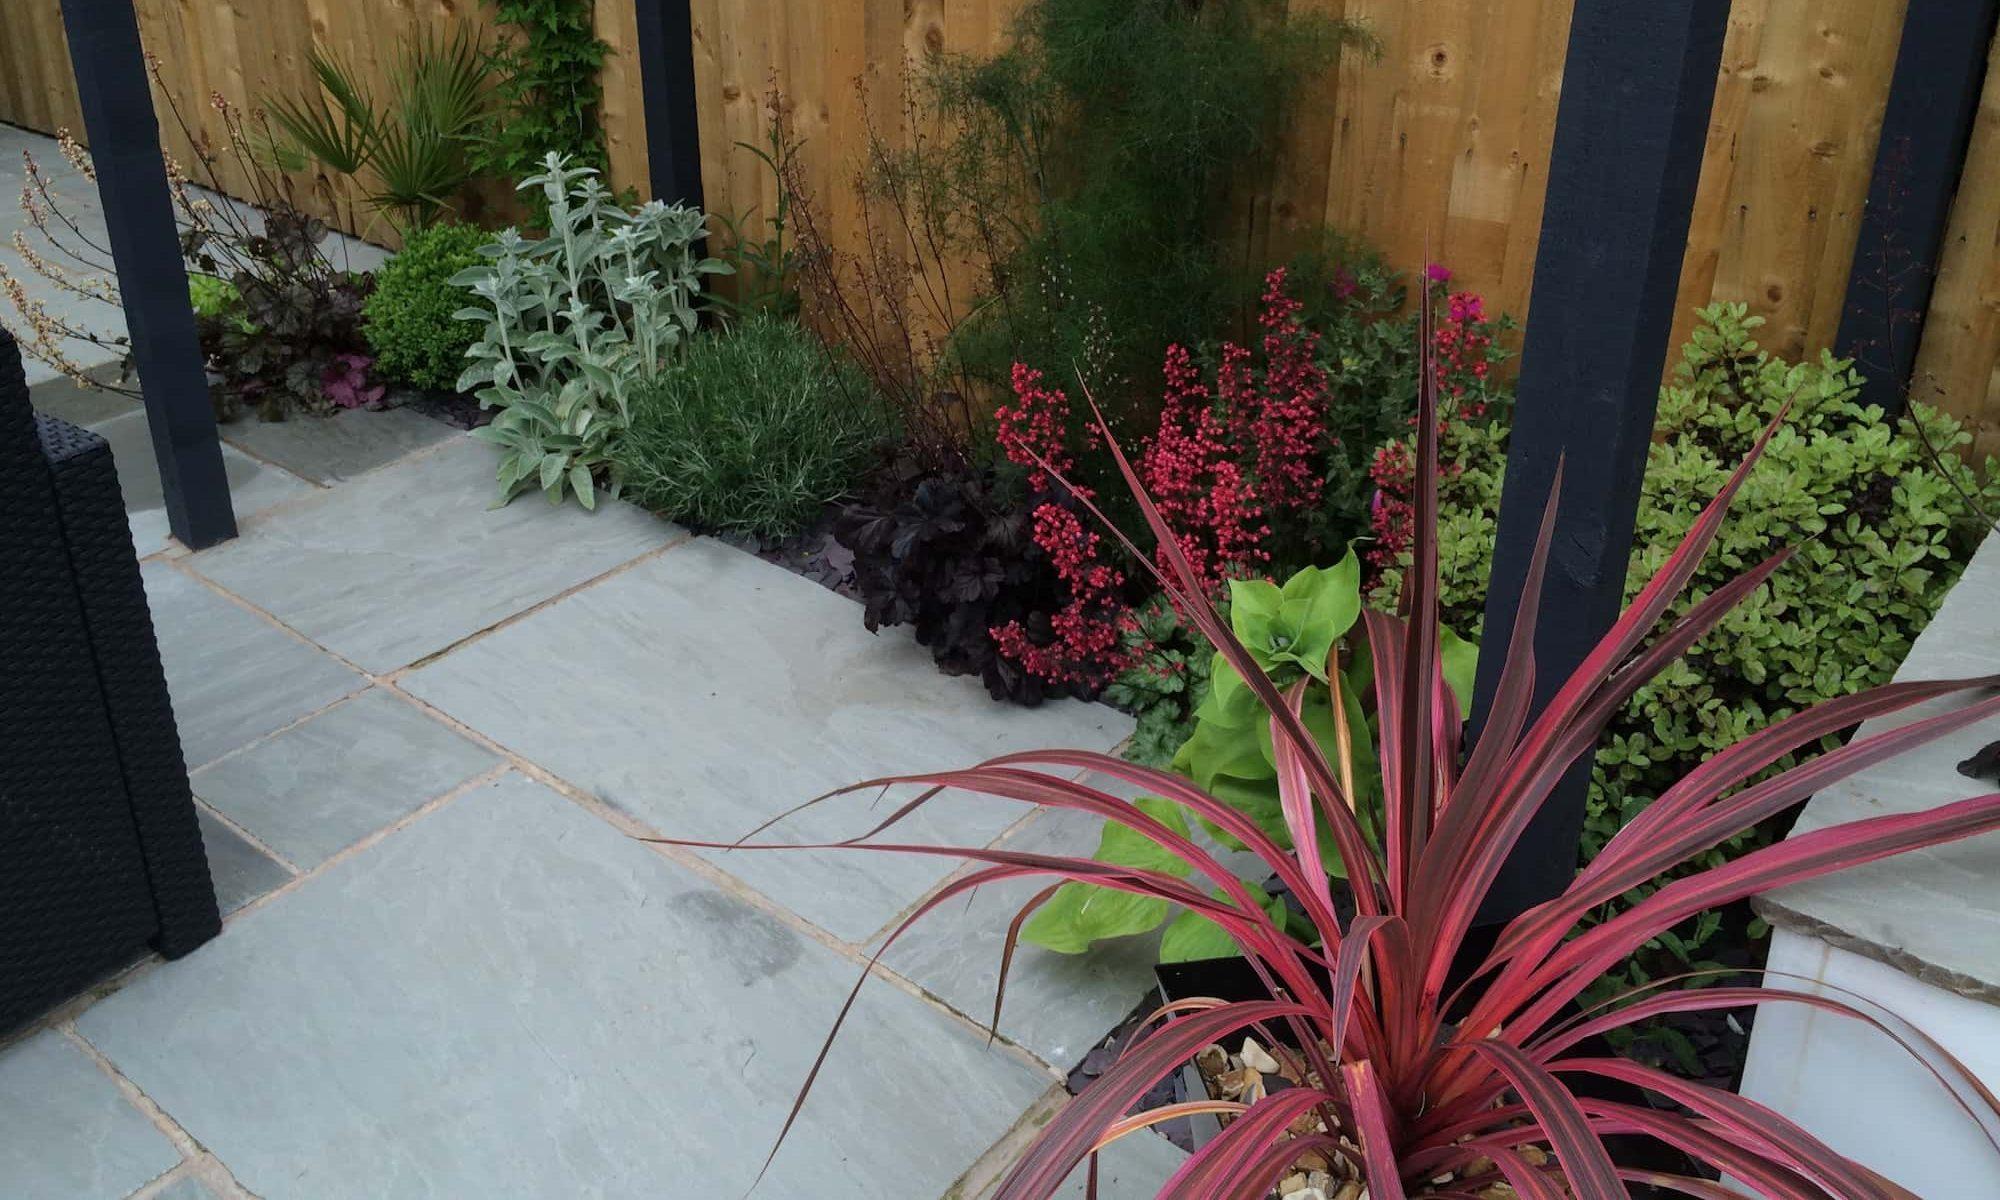 Arcadia Blog | Bespoke Garden & Landscape Services on Arcadia Backyard Designs id=42836